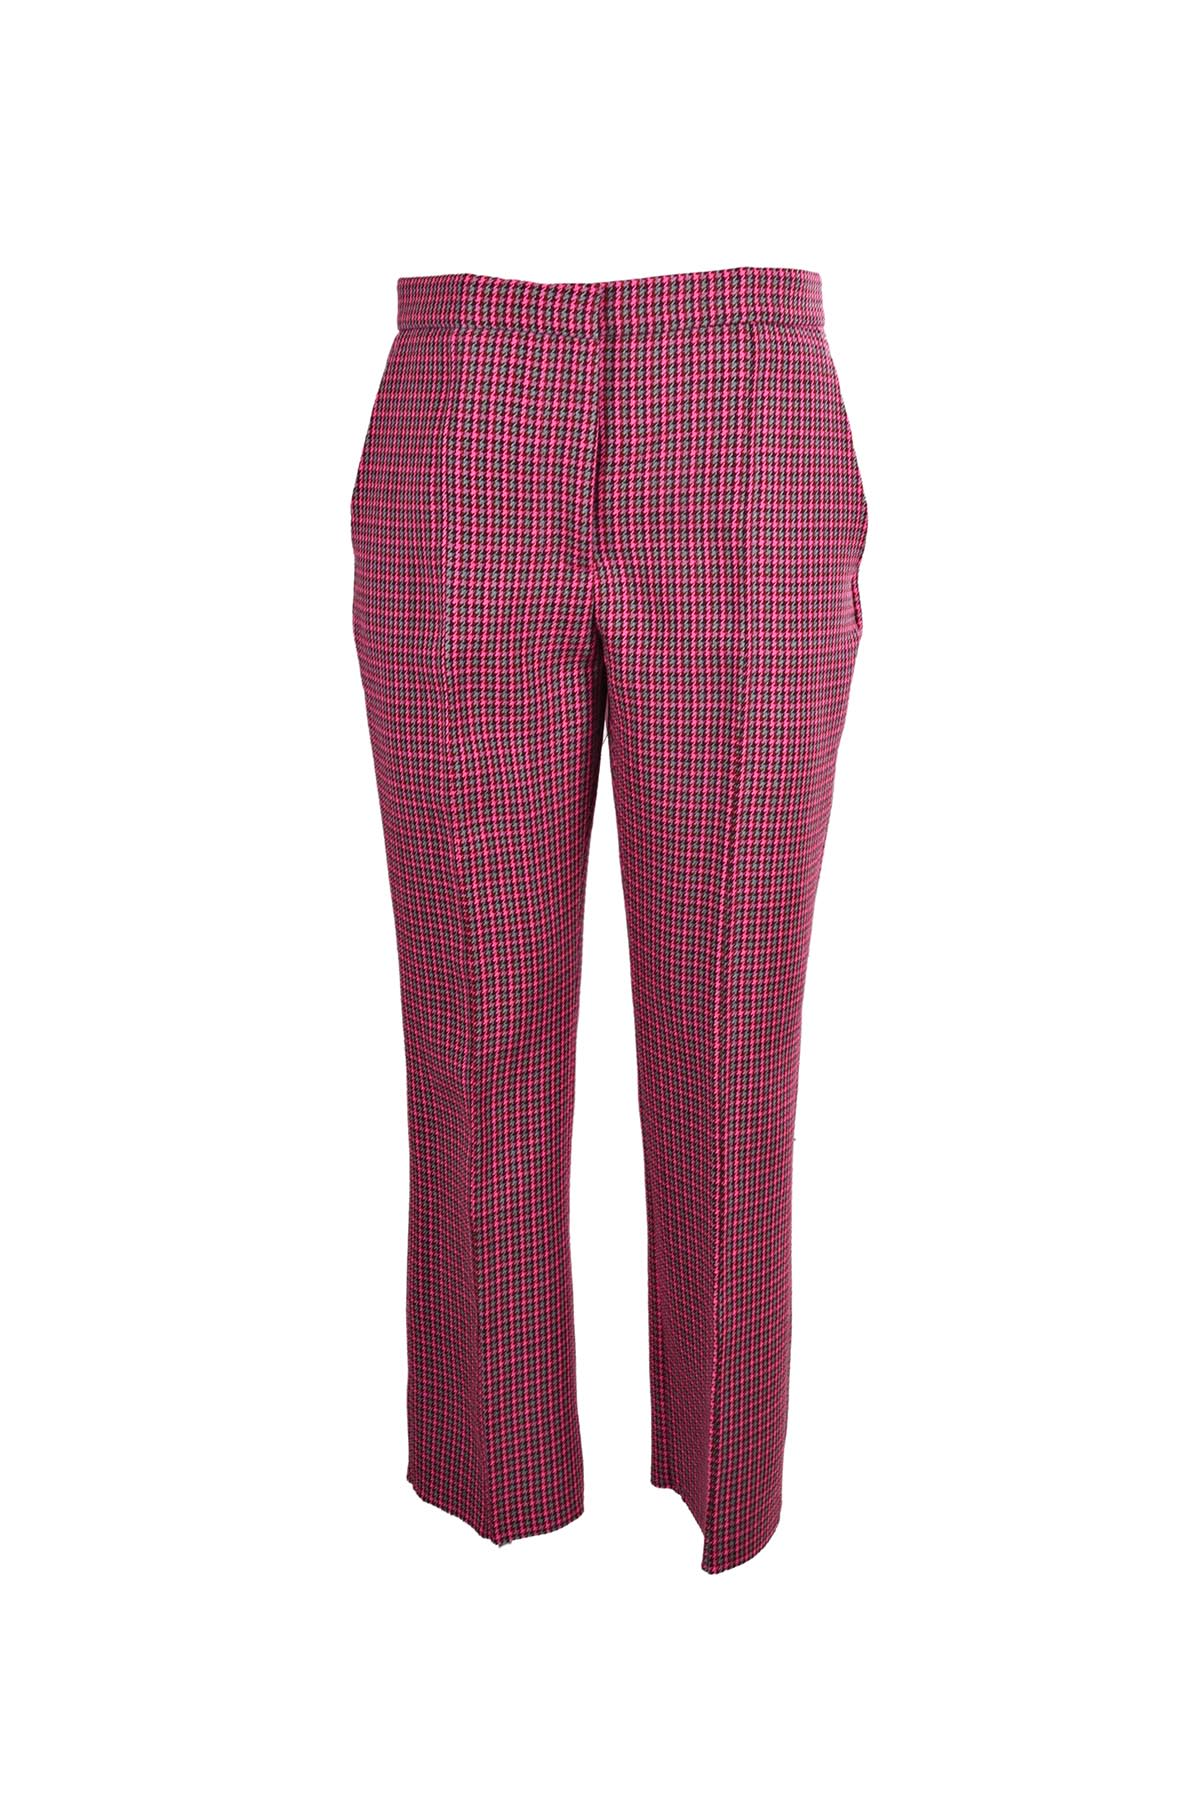 MSGM Check Pants